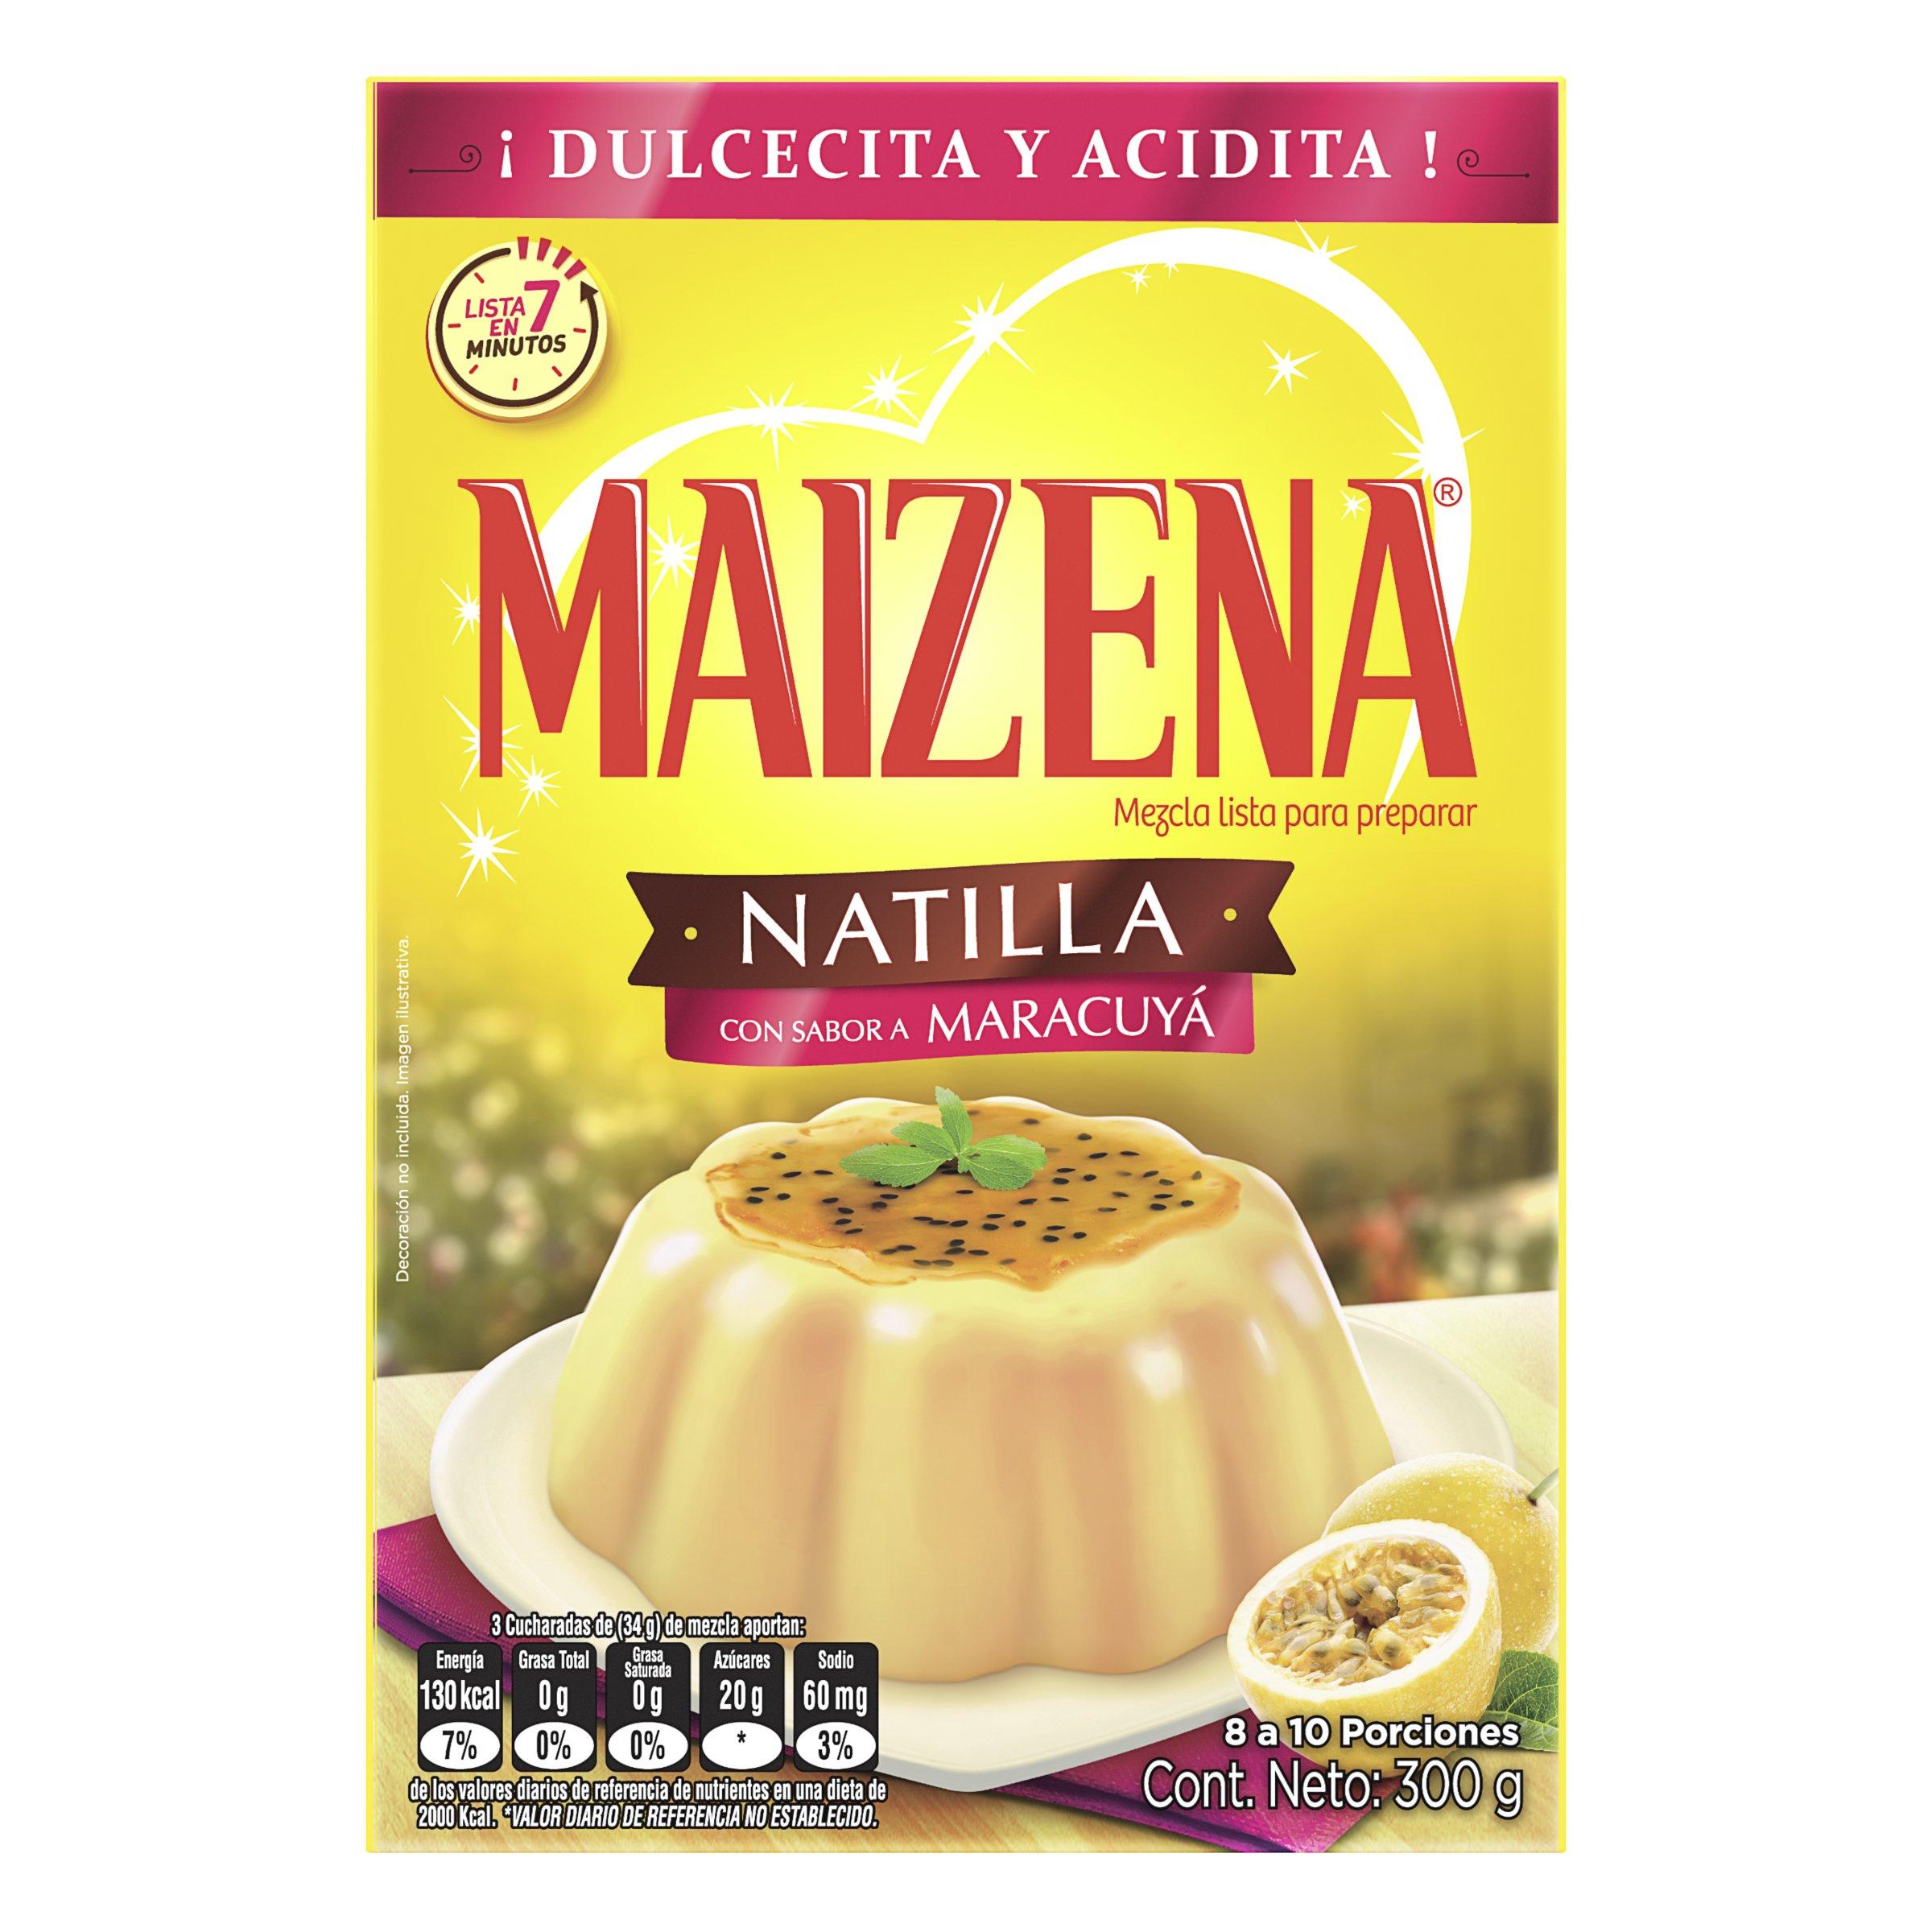 Mezcla Natilla Maizena Maracuya 300g